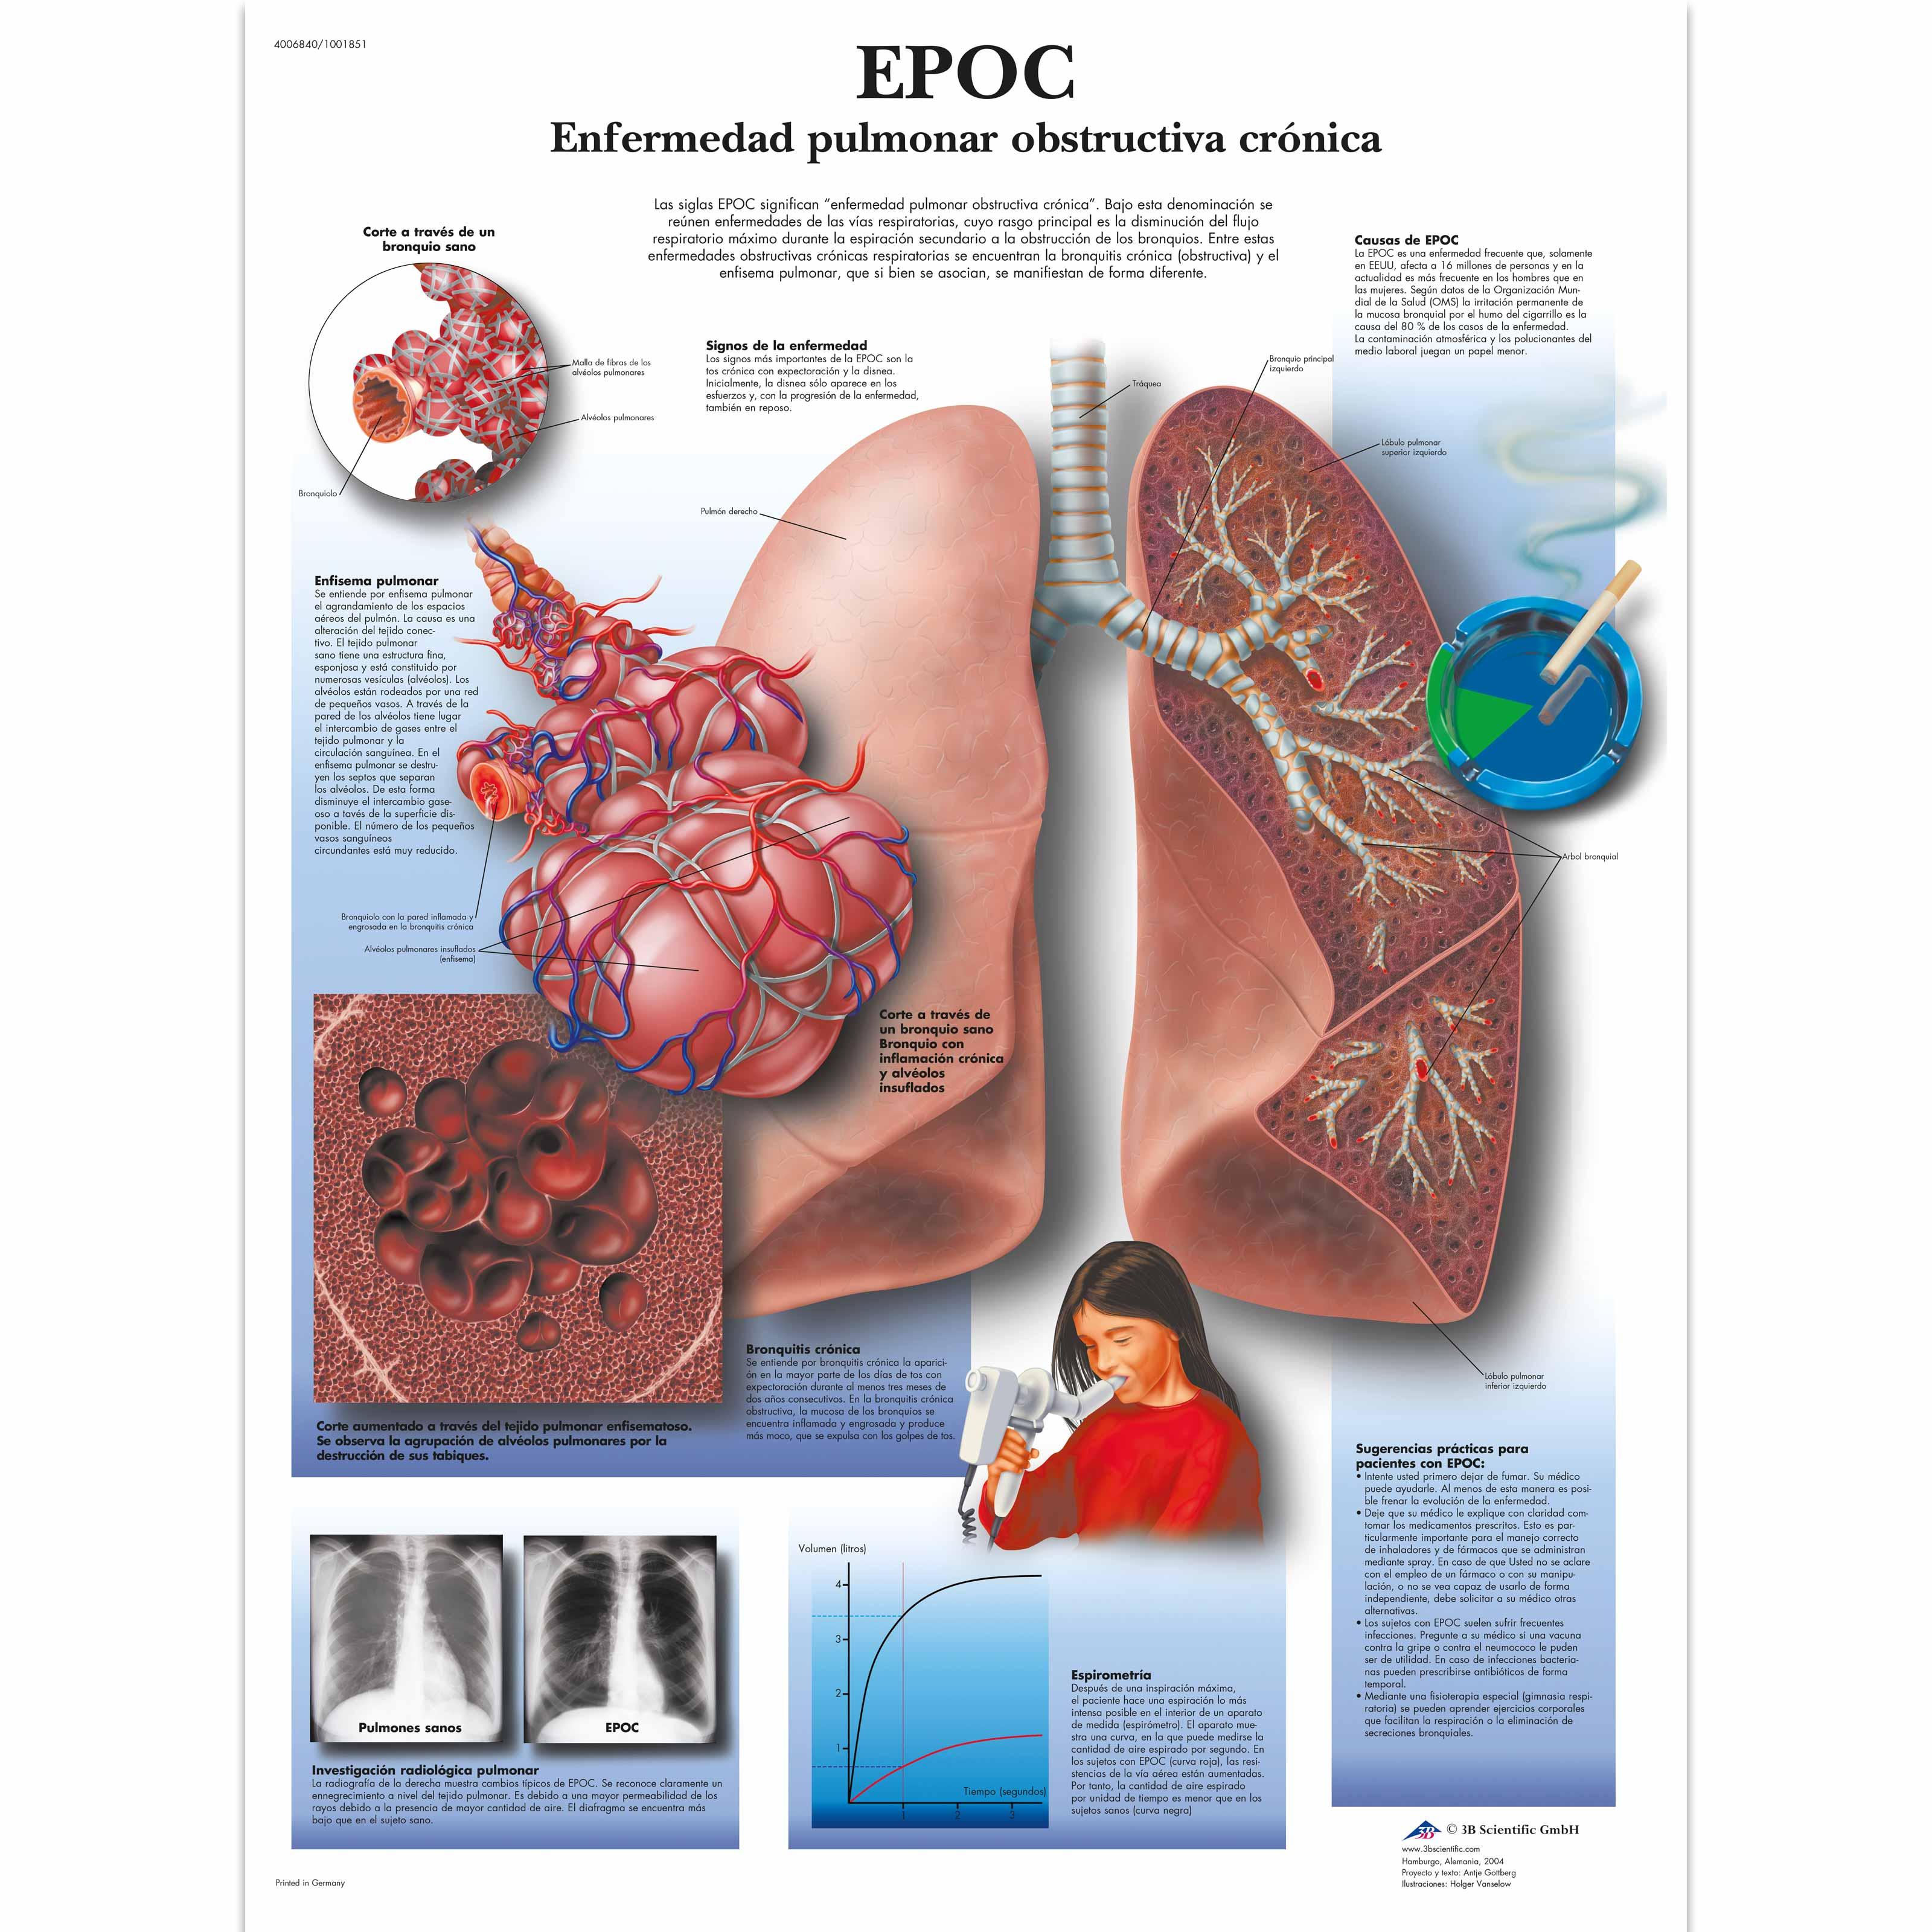 EPOC Enfermedad pulmonar obstructiva crónica - 4006840 - 3B ...